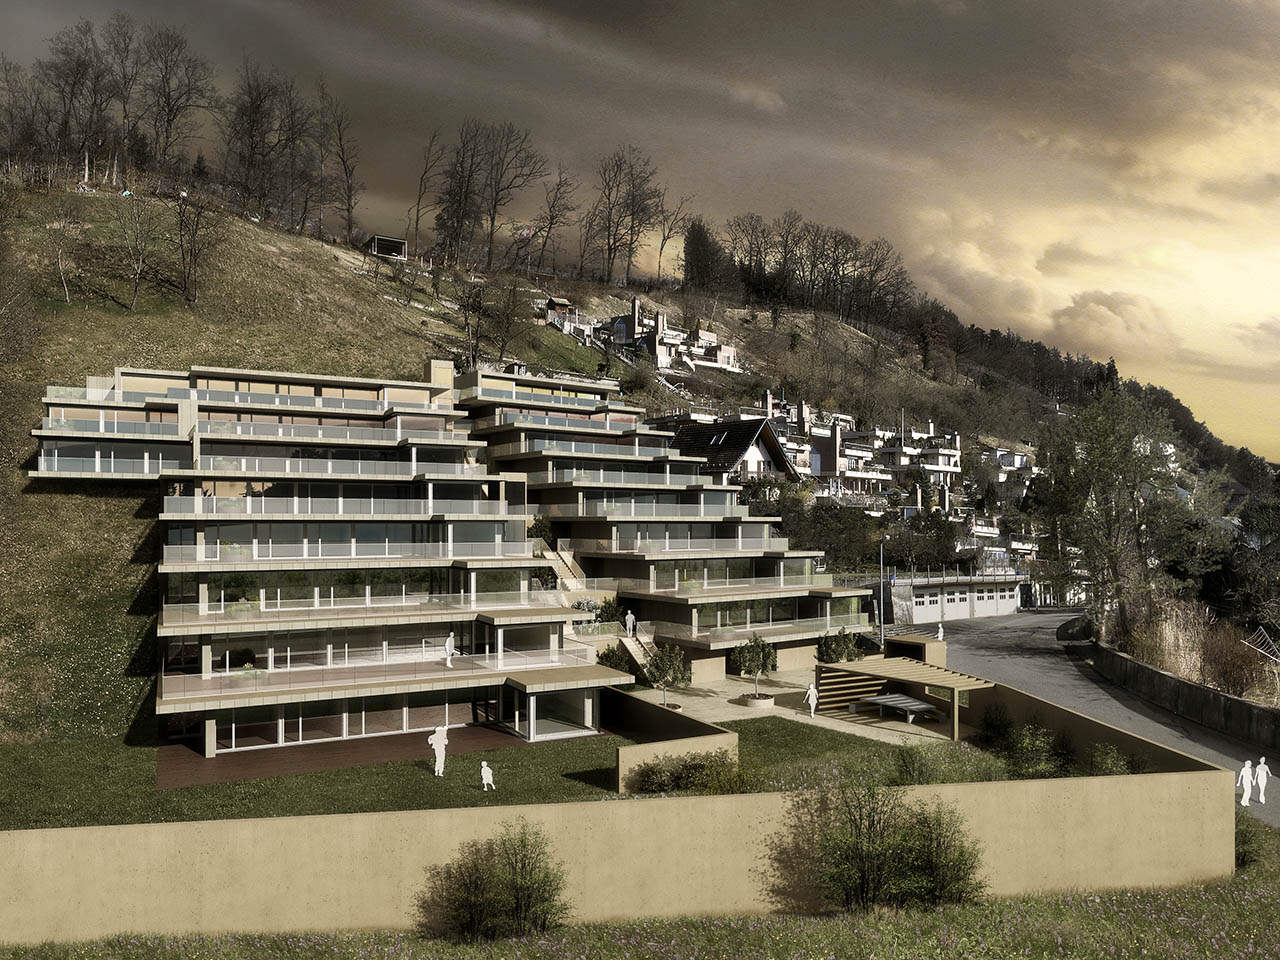 laubhus-architektur-mehrfamilienhaus-th-herrenmatt-wettbewerb